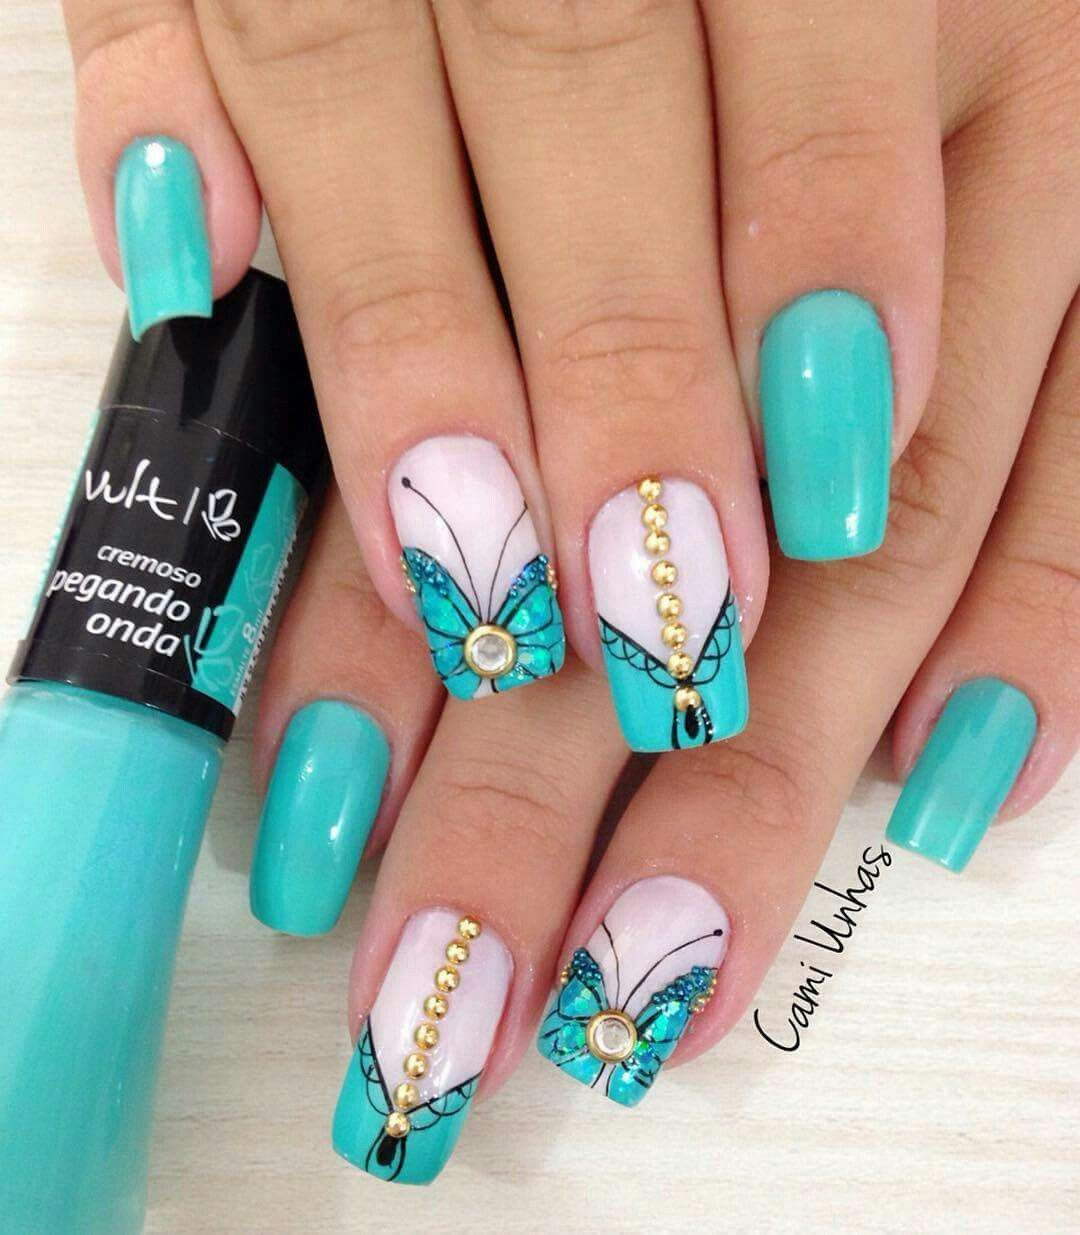 Pin de Ana Yanci Ramirez Quesada en uñas | Pinterest | Diseños de ...